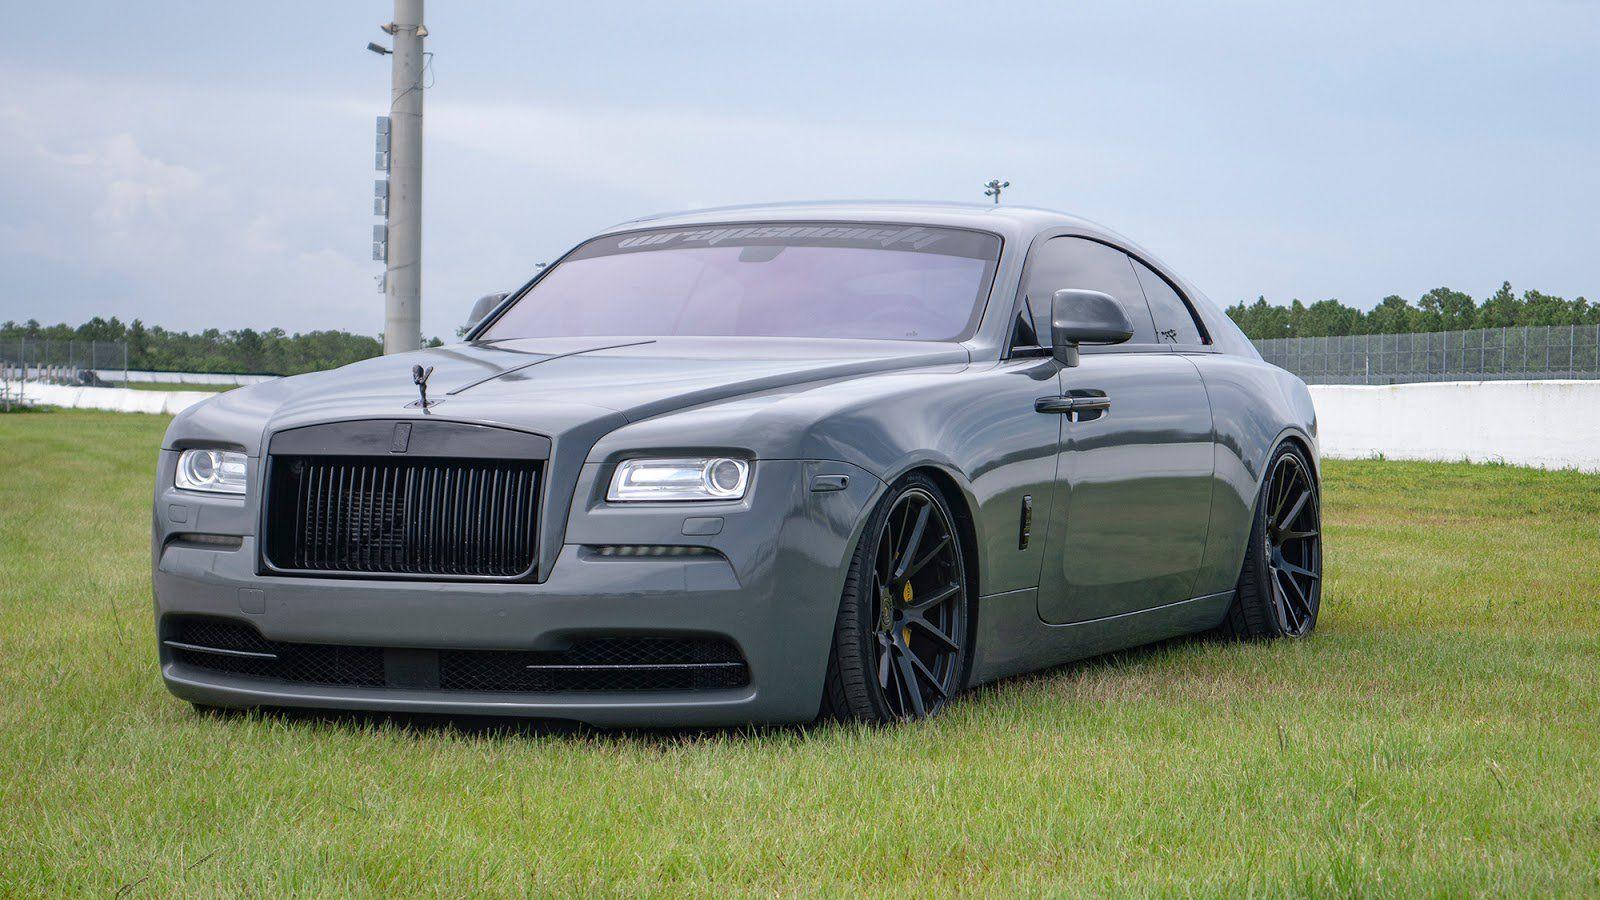 RollsRoyce Wraith Rolls royce, Rolls royce wraith